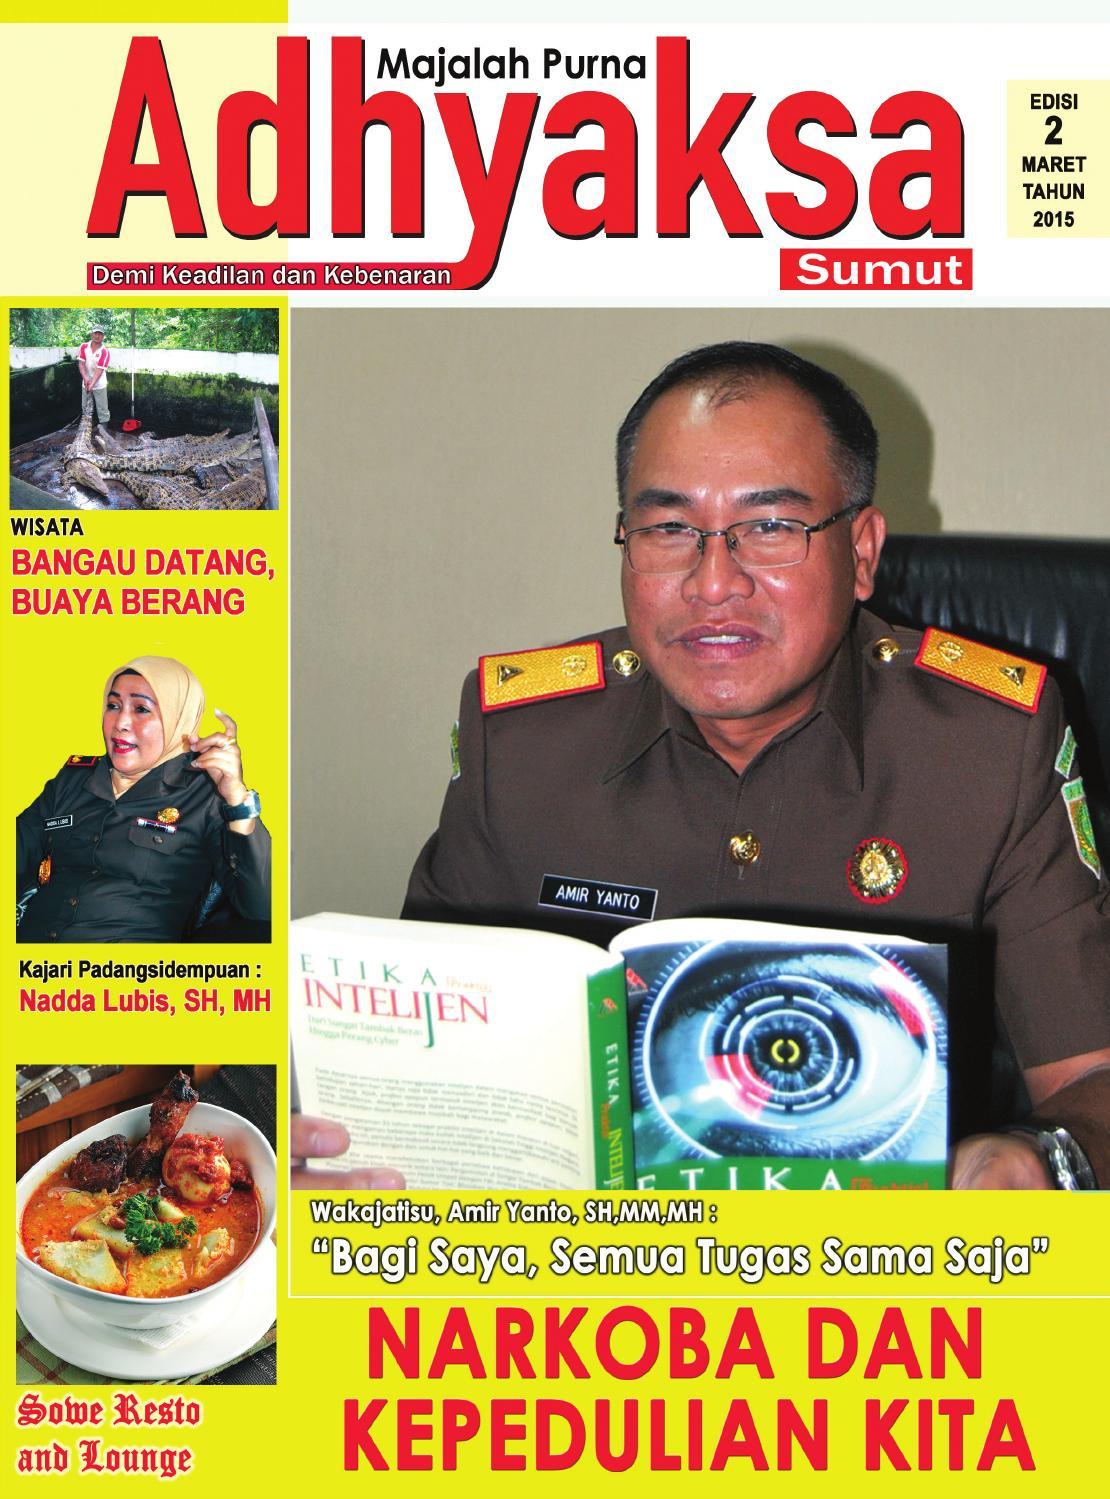 Majalah Purna Adhyaksa Edisi 2 By Issuu Produk Ukm Bumn Frozen Tahu Baxo